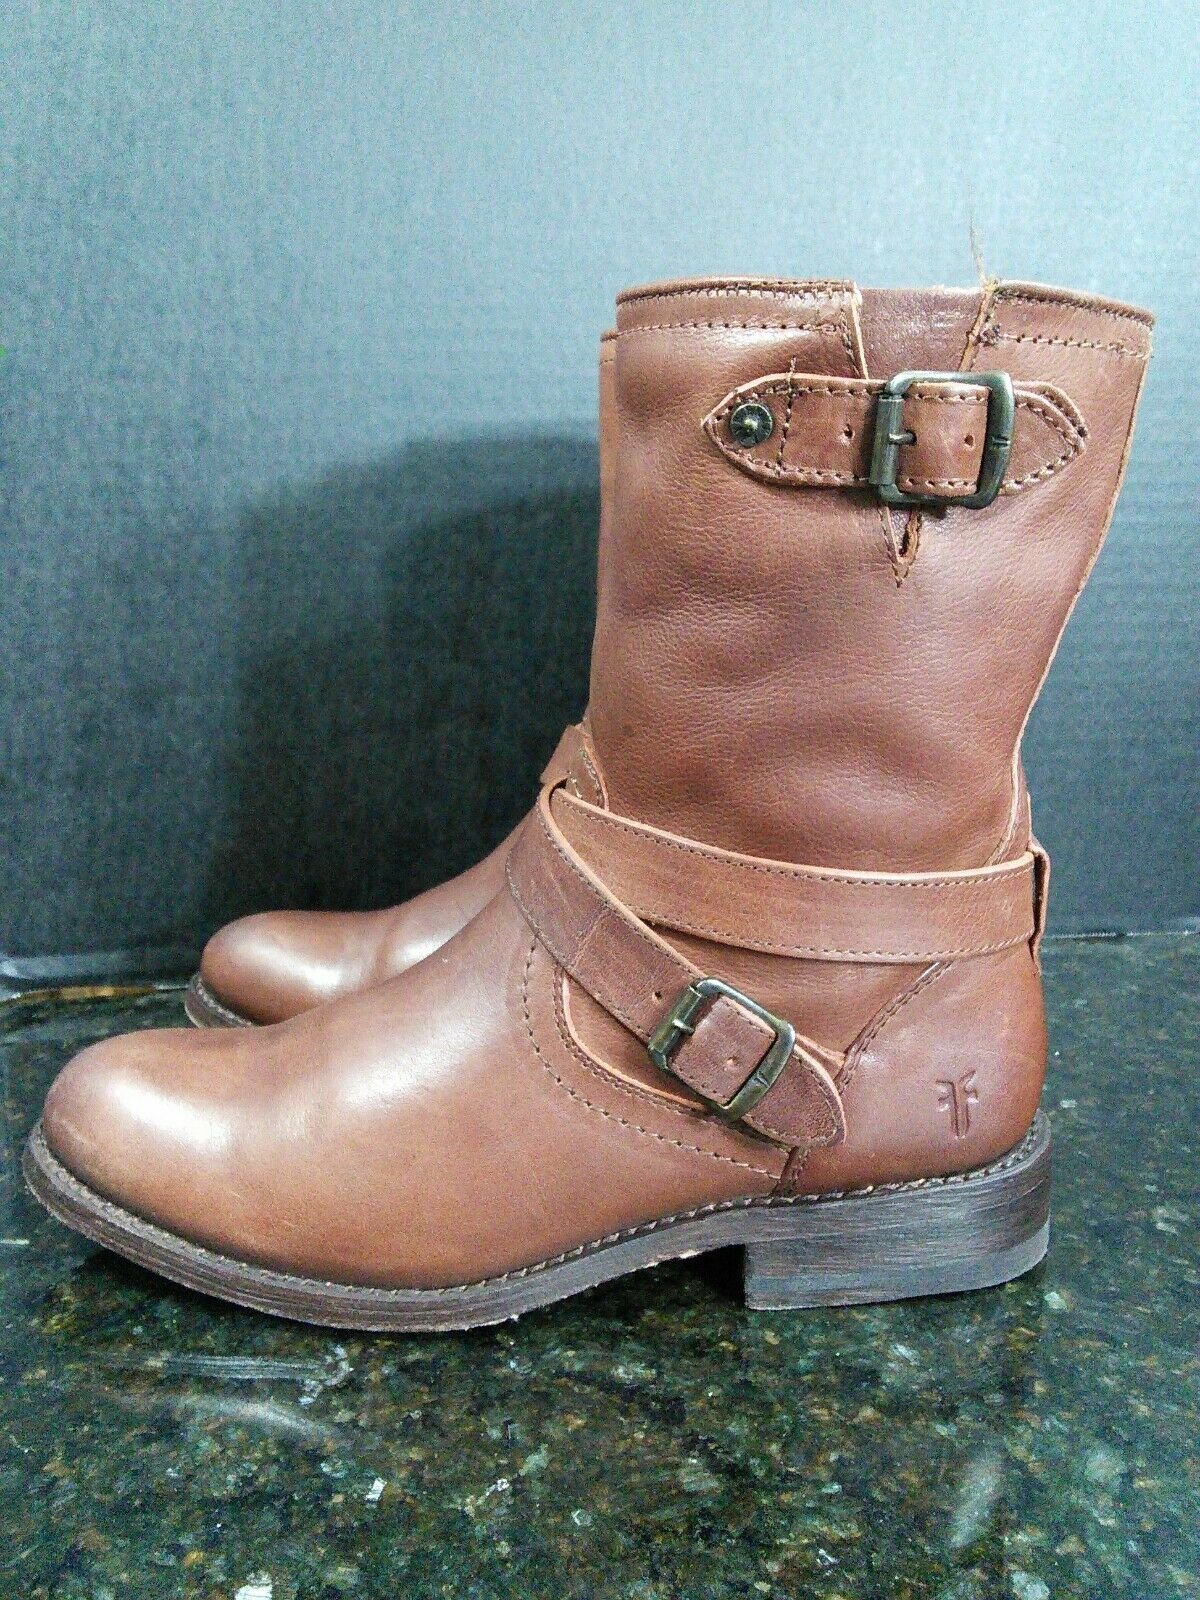 Frye Donna's Jayden Cross Engineer Boot, Dark Brown: Size 6.5 Gently Worn #B10